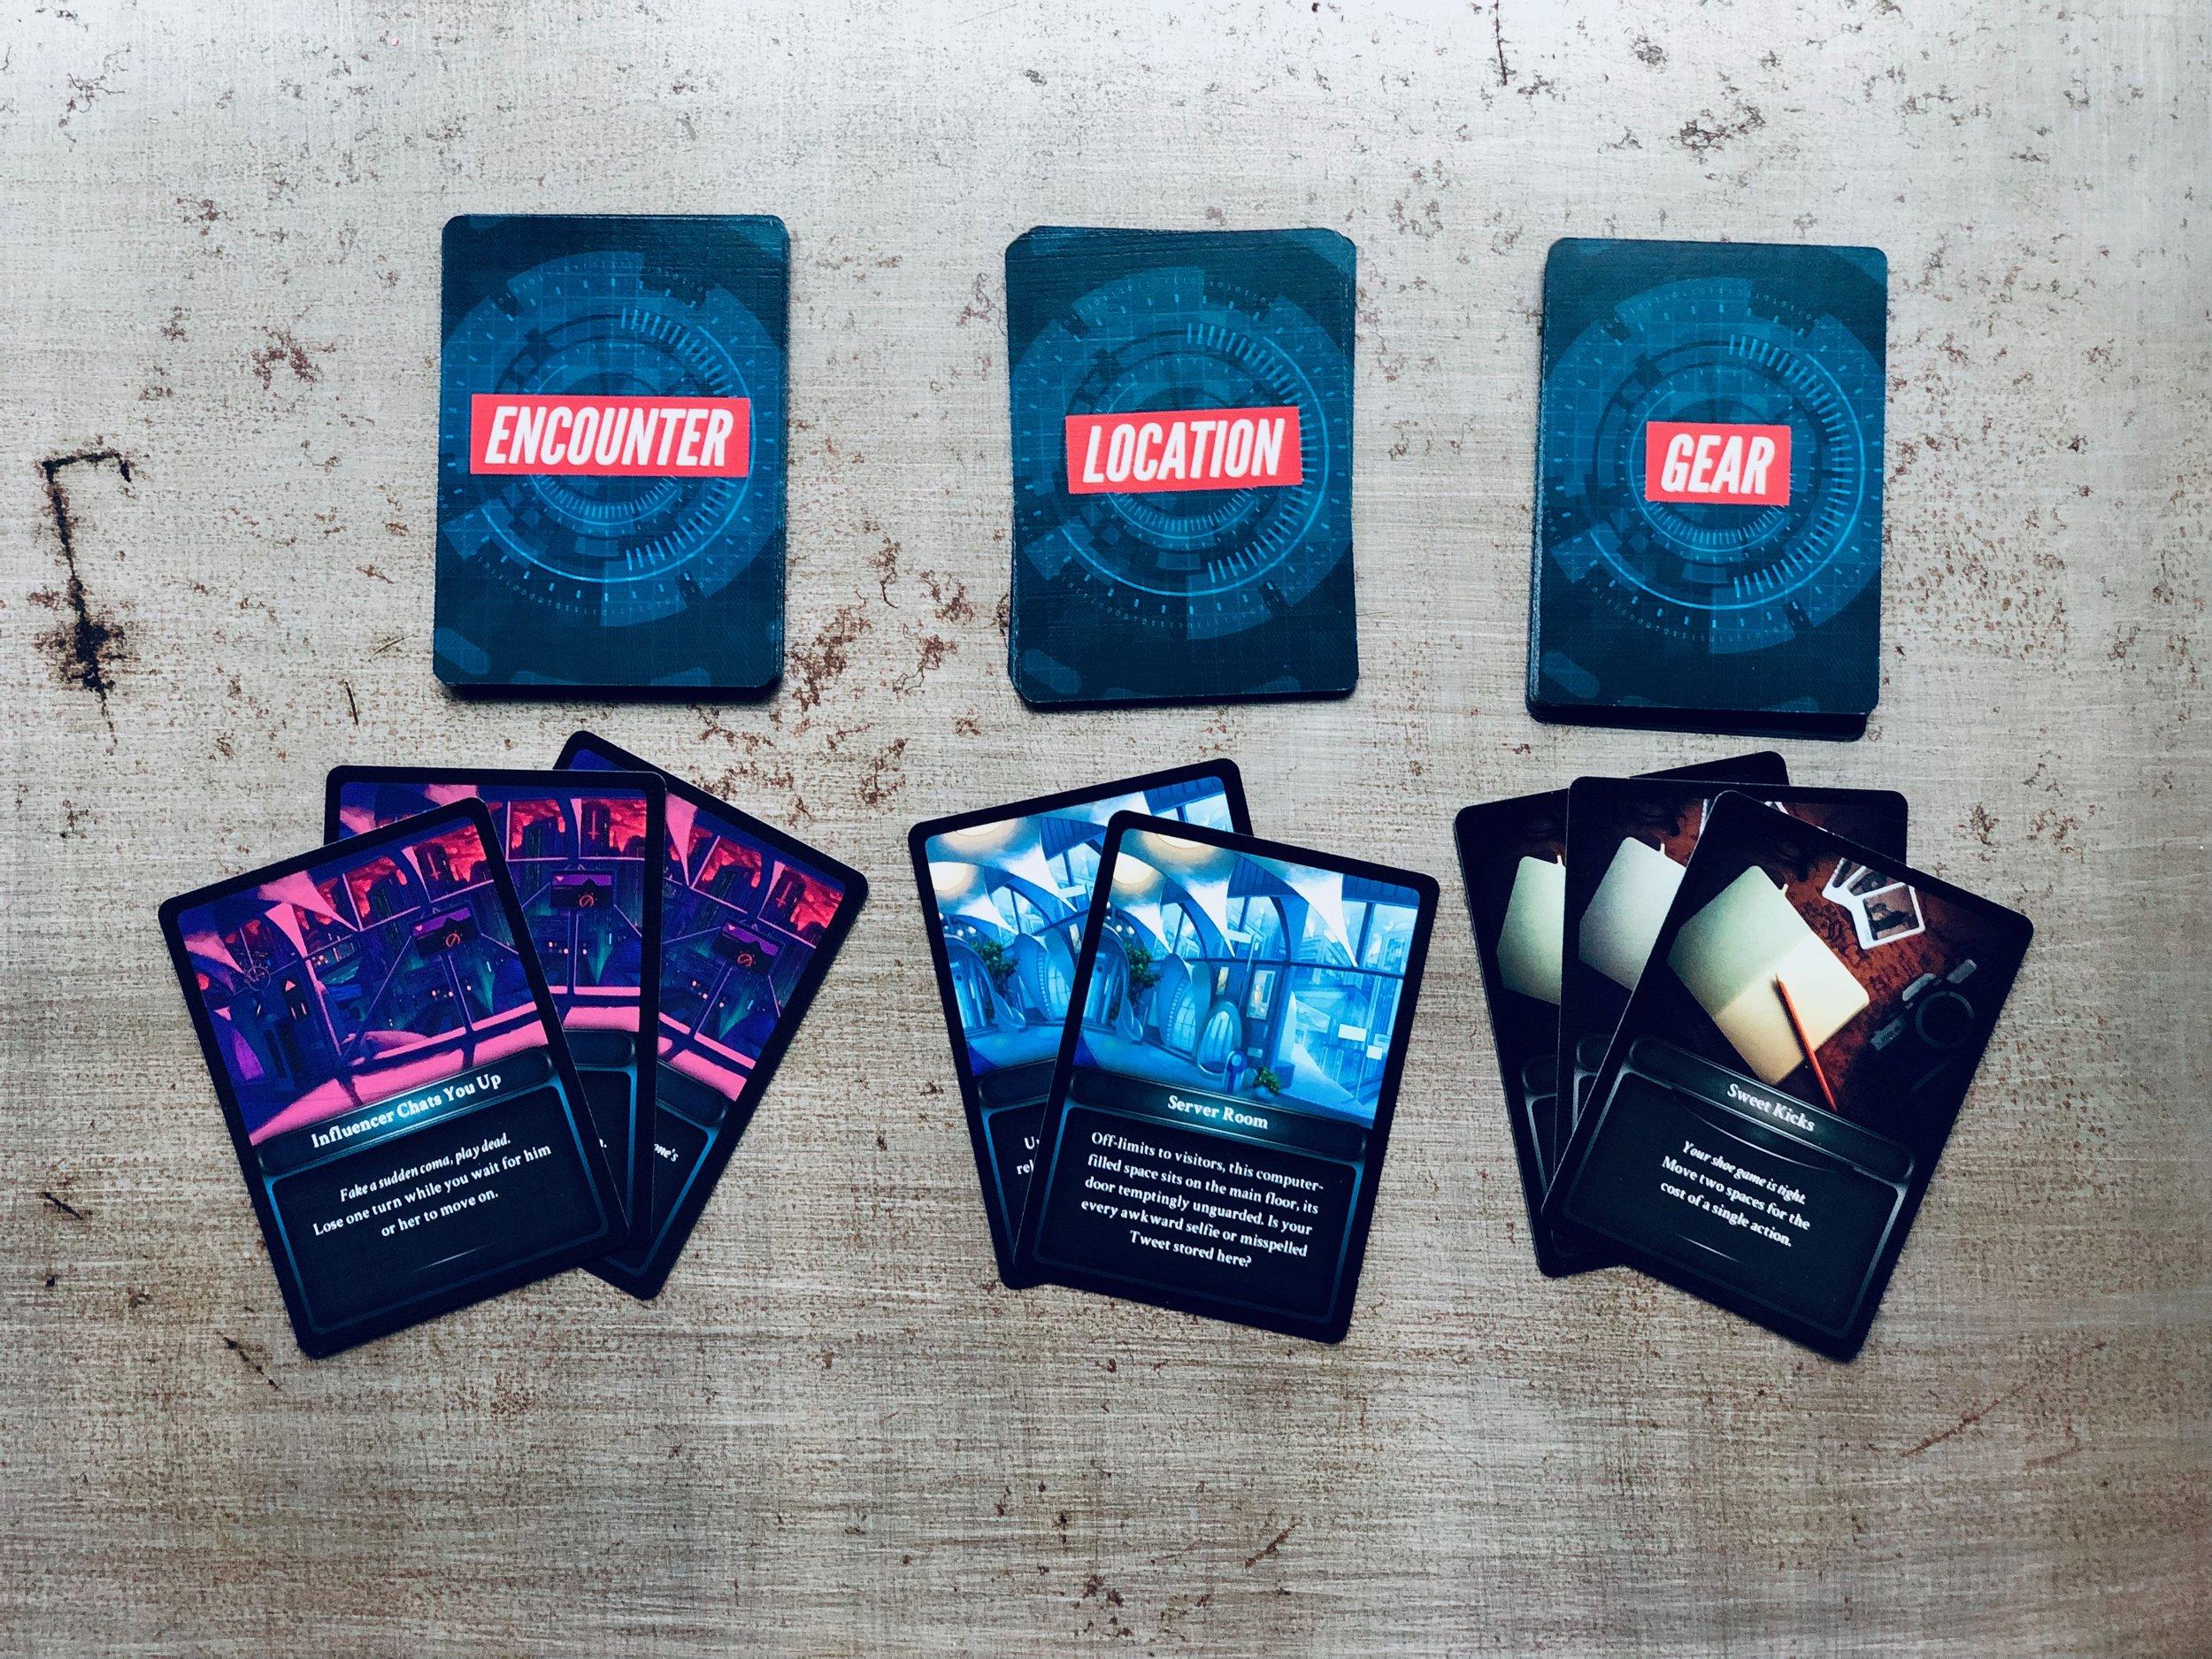 Poker-size cards